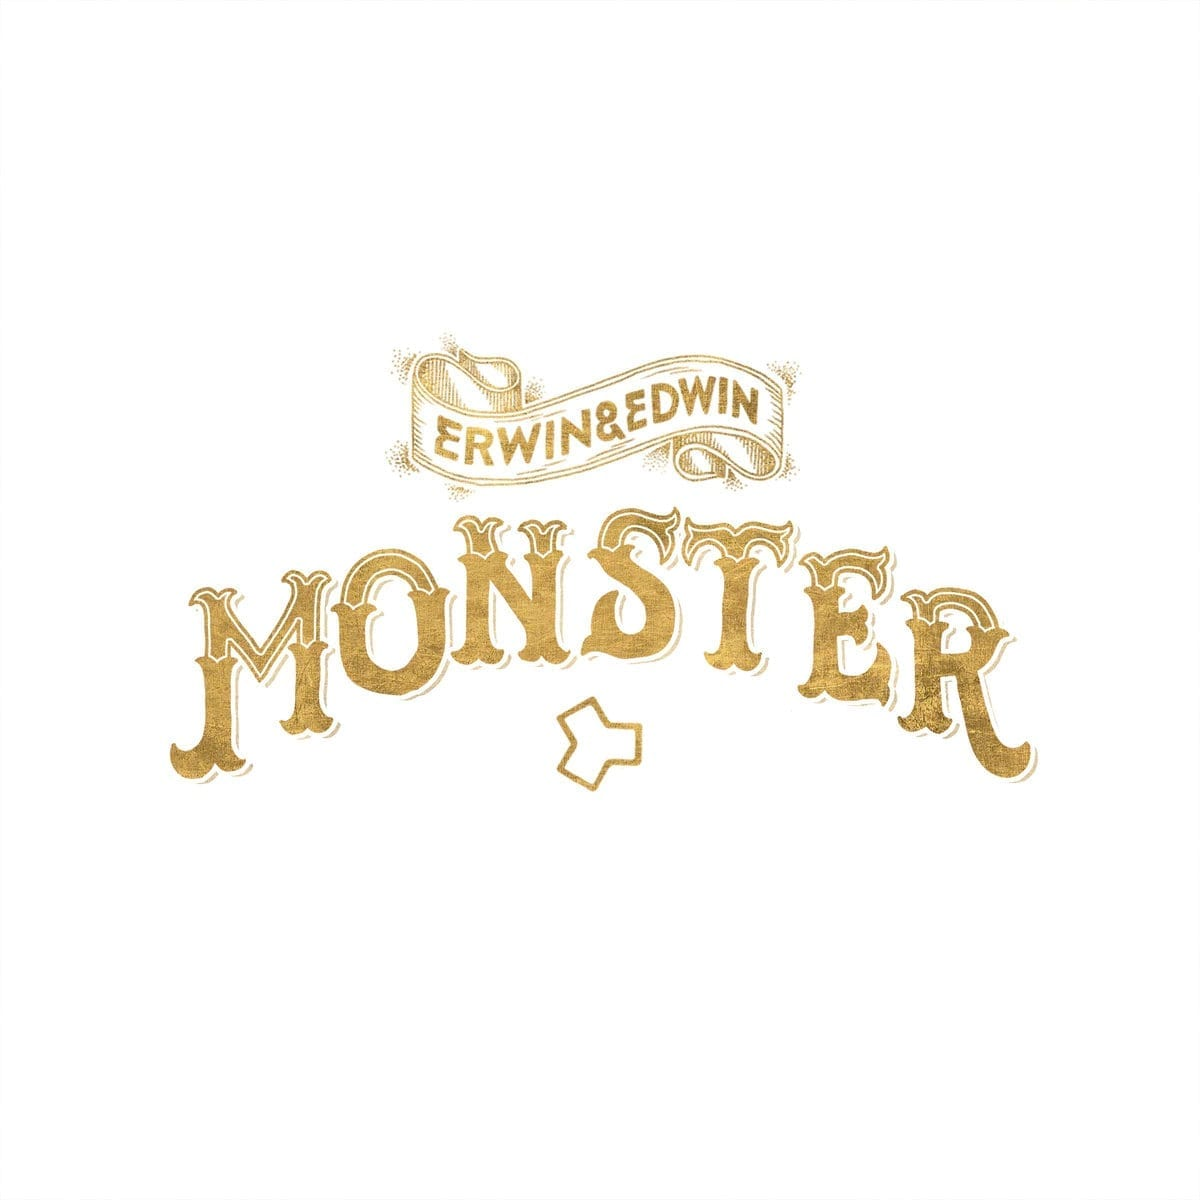 Erwin & Edwin Monster Aufnahme